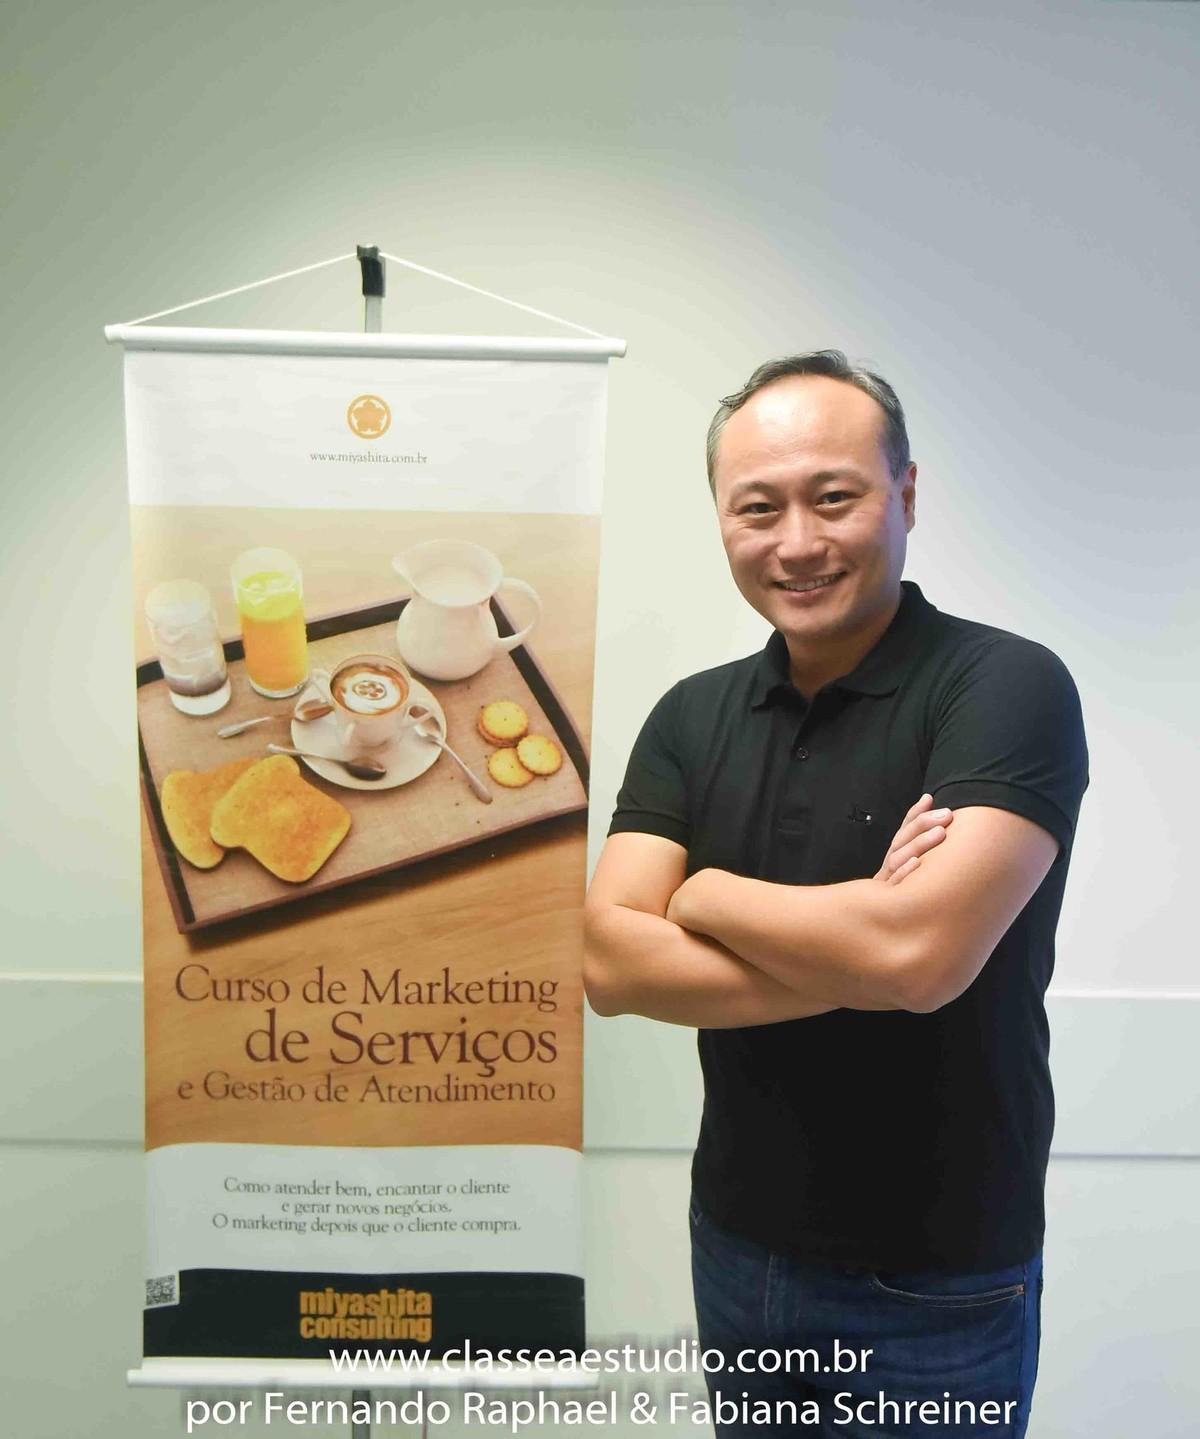 consultor de marketing Marcelo Miyashita